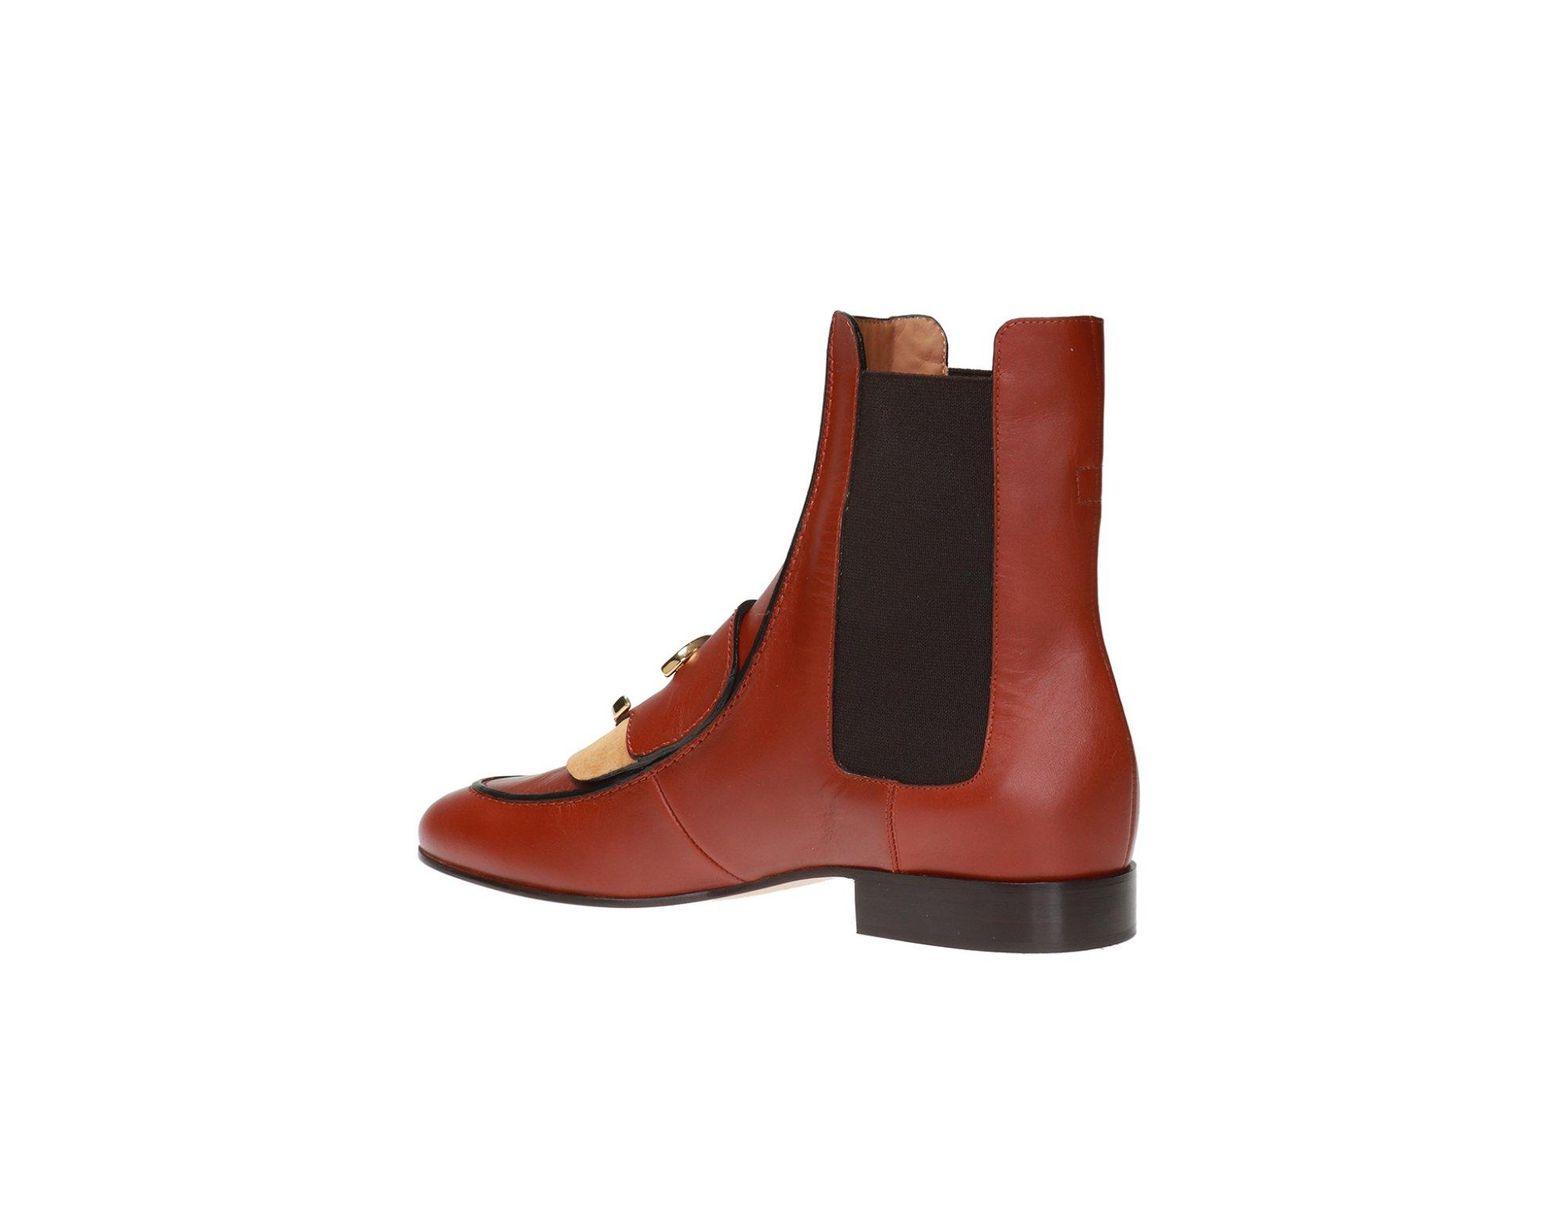 1de4a6ffa5 Women's Brown 'chloé C' Ankle Boots With Logo